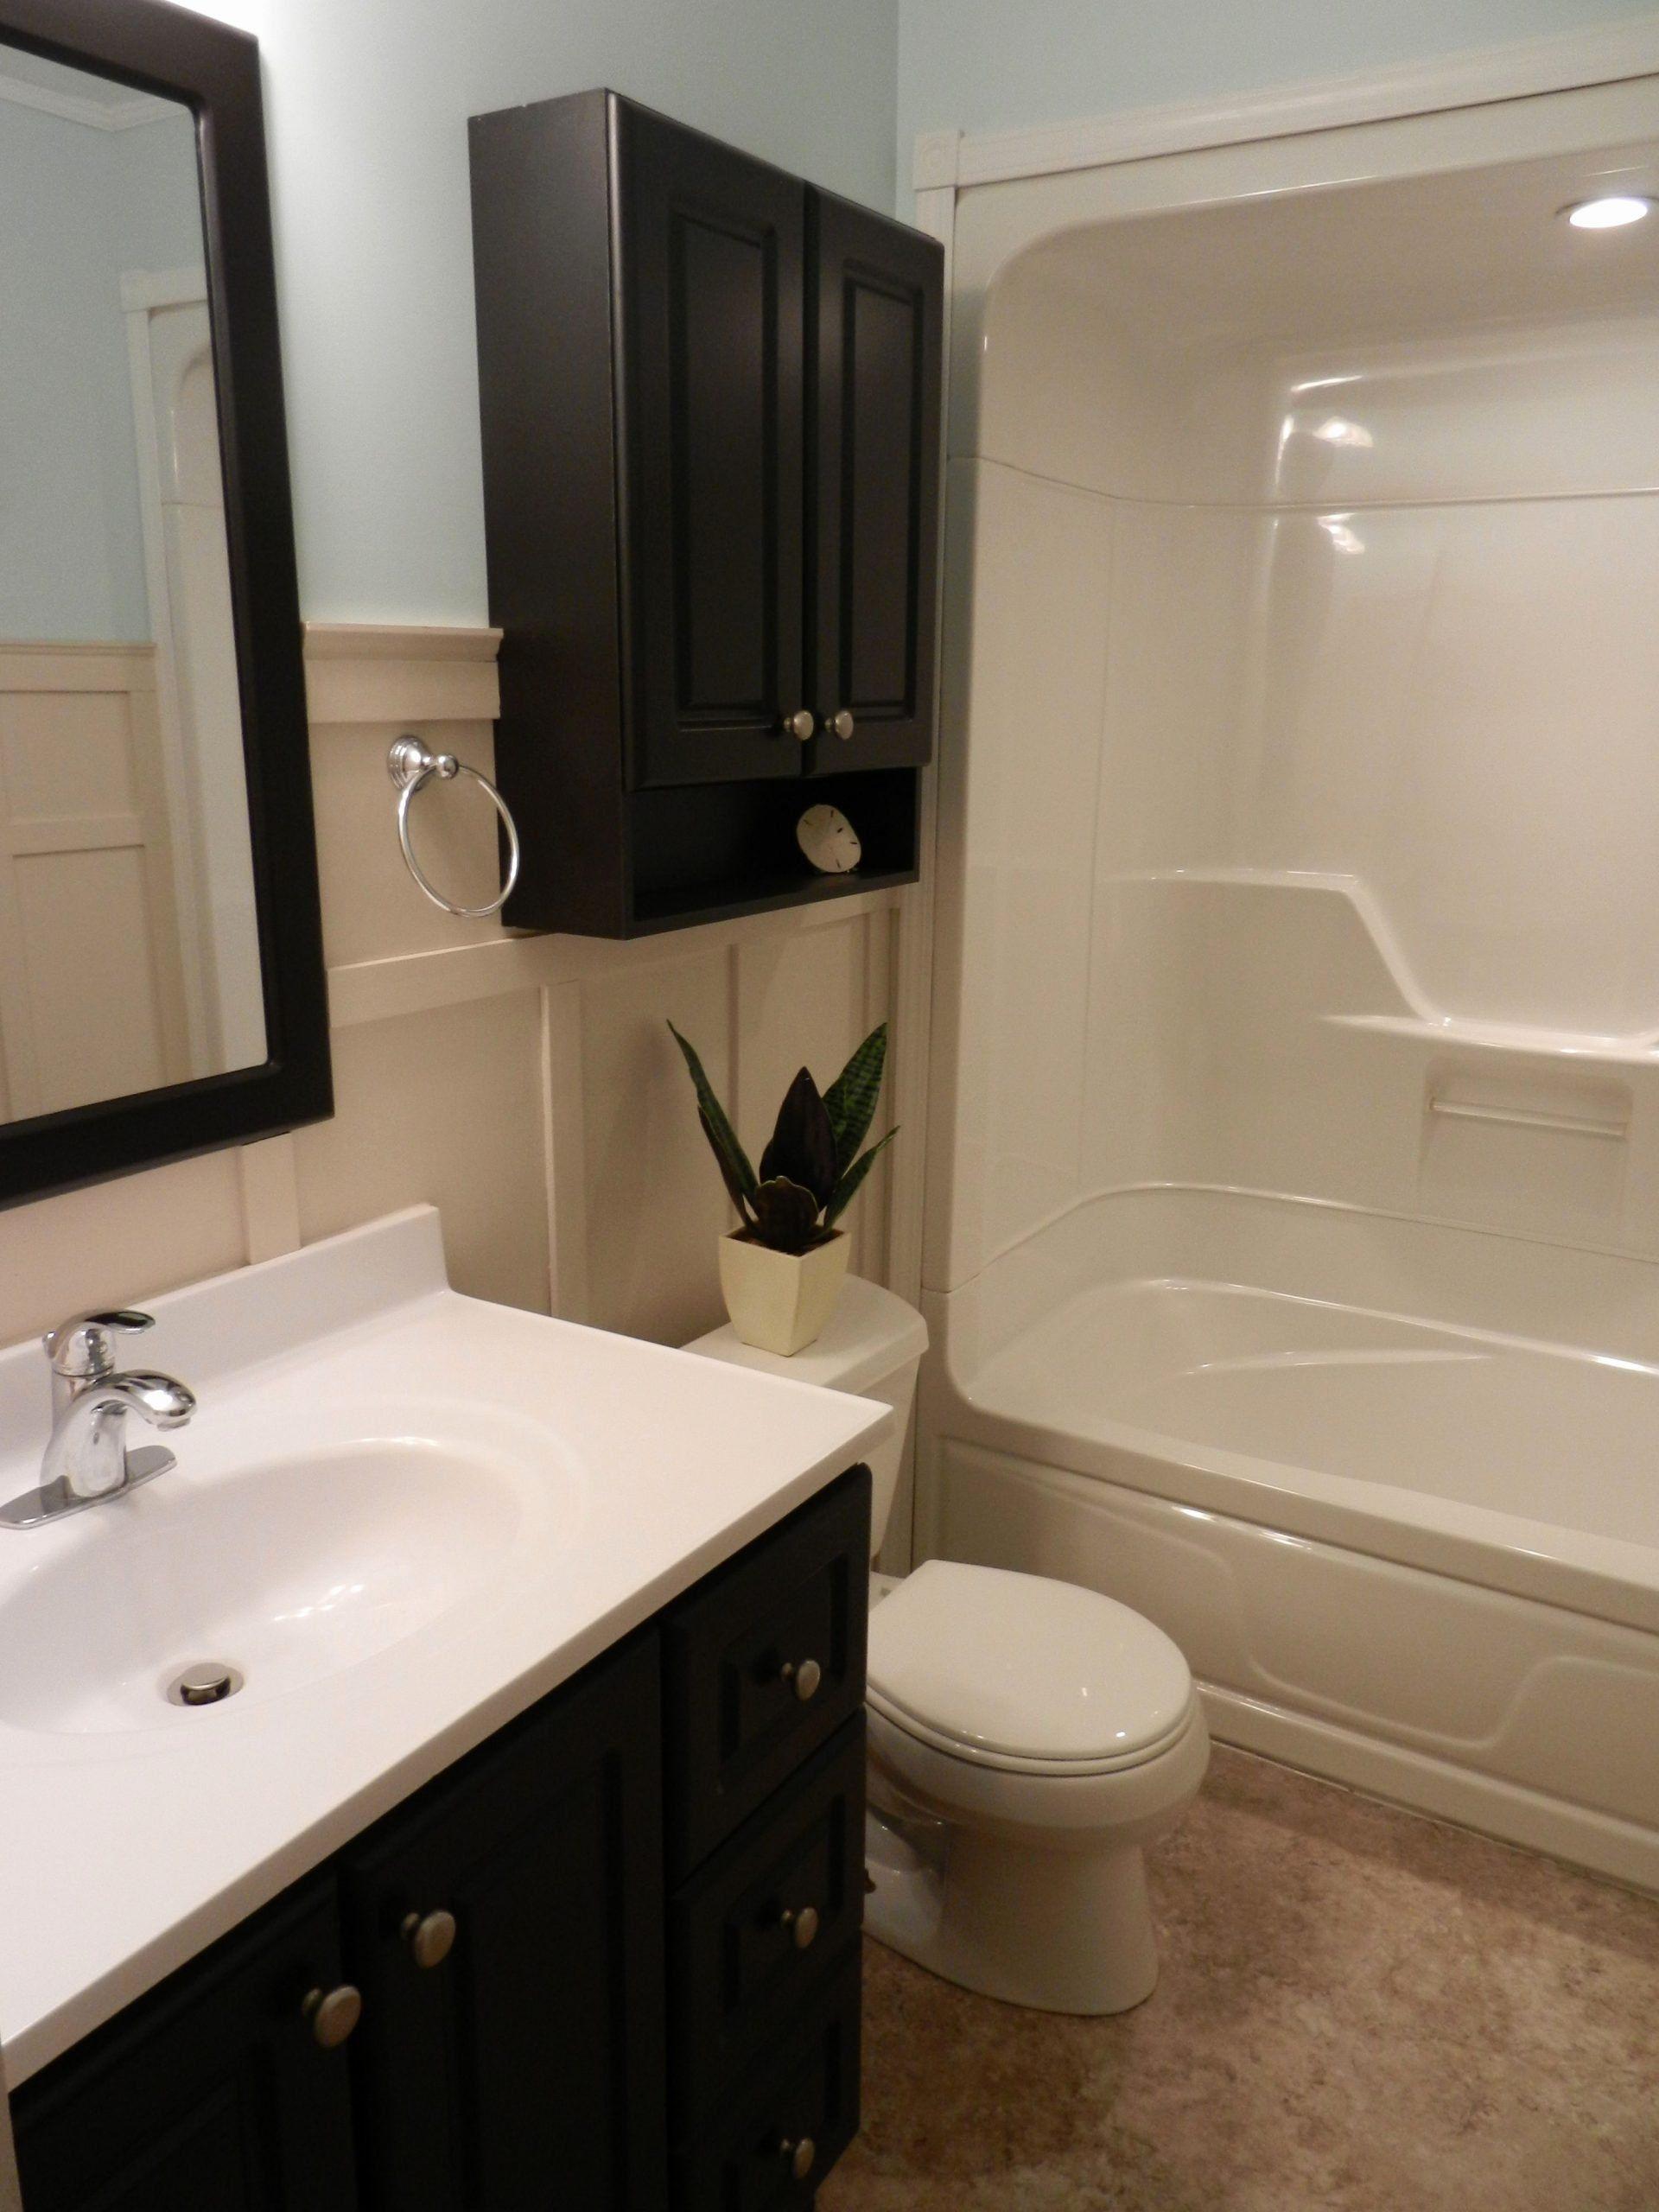 Pin On Top Bathroom Decor Ideas 2020